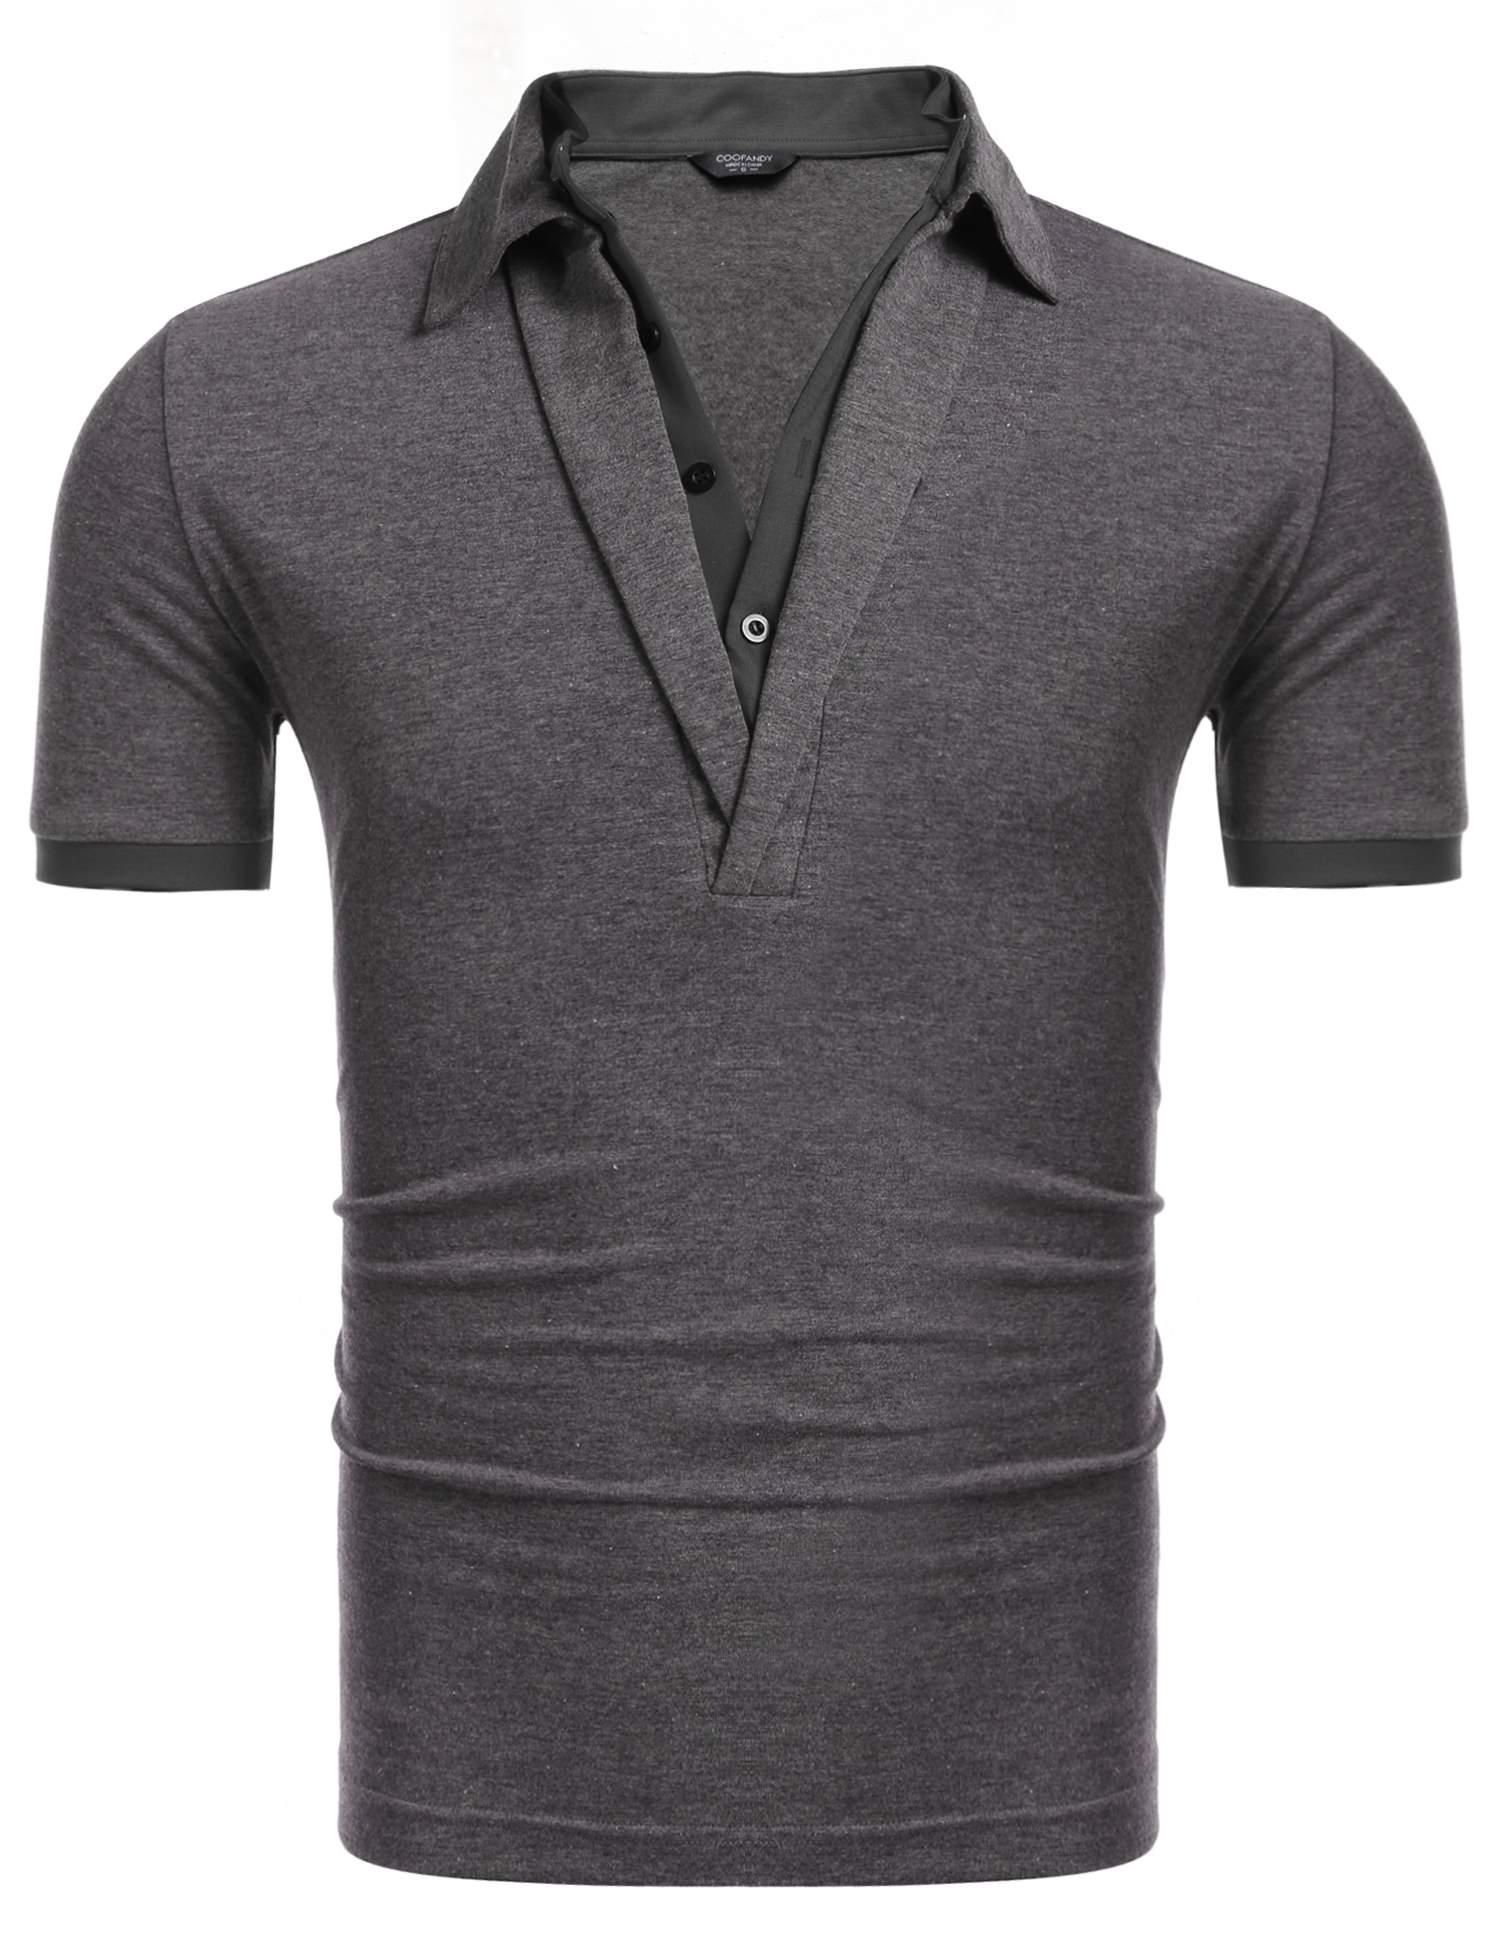 low priced 0da29 9e538 Sunshine New Men Casual V-Neck Short Sleeve Contrast Color False Two Pieces  Pullover Elastic Polo Shirt-Dark Gray Black